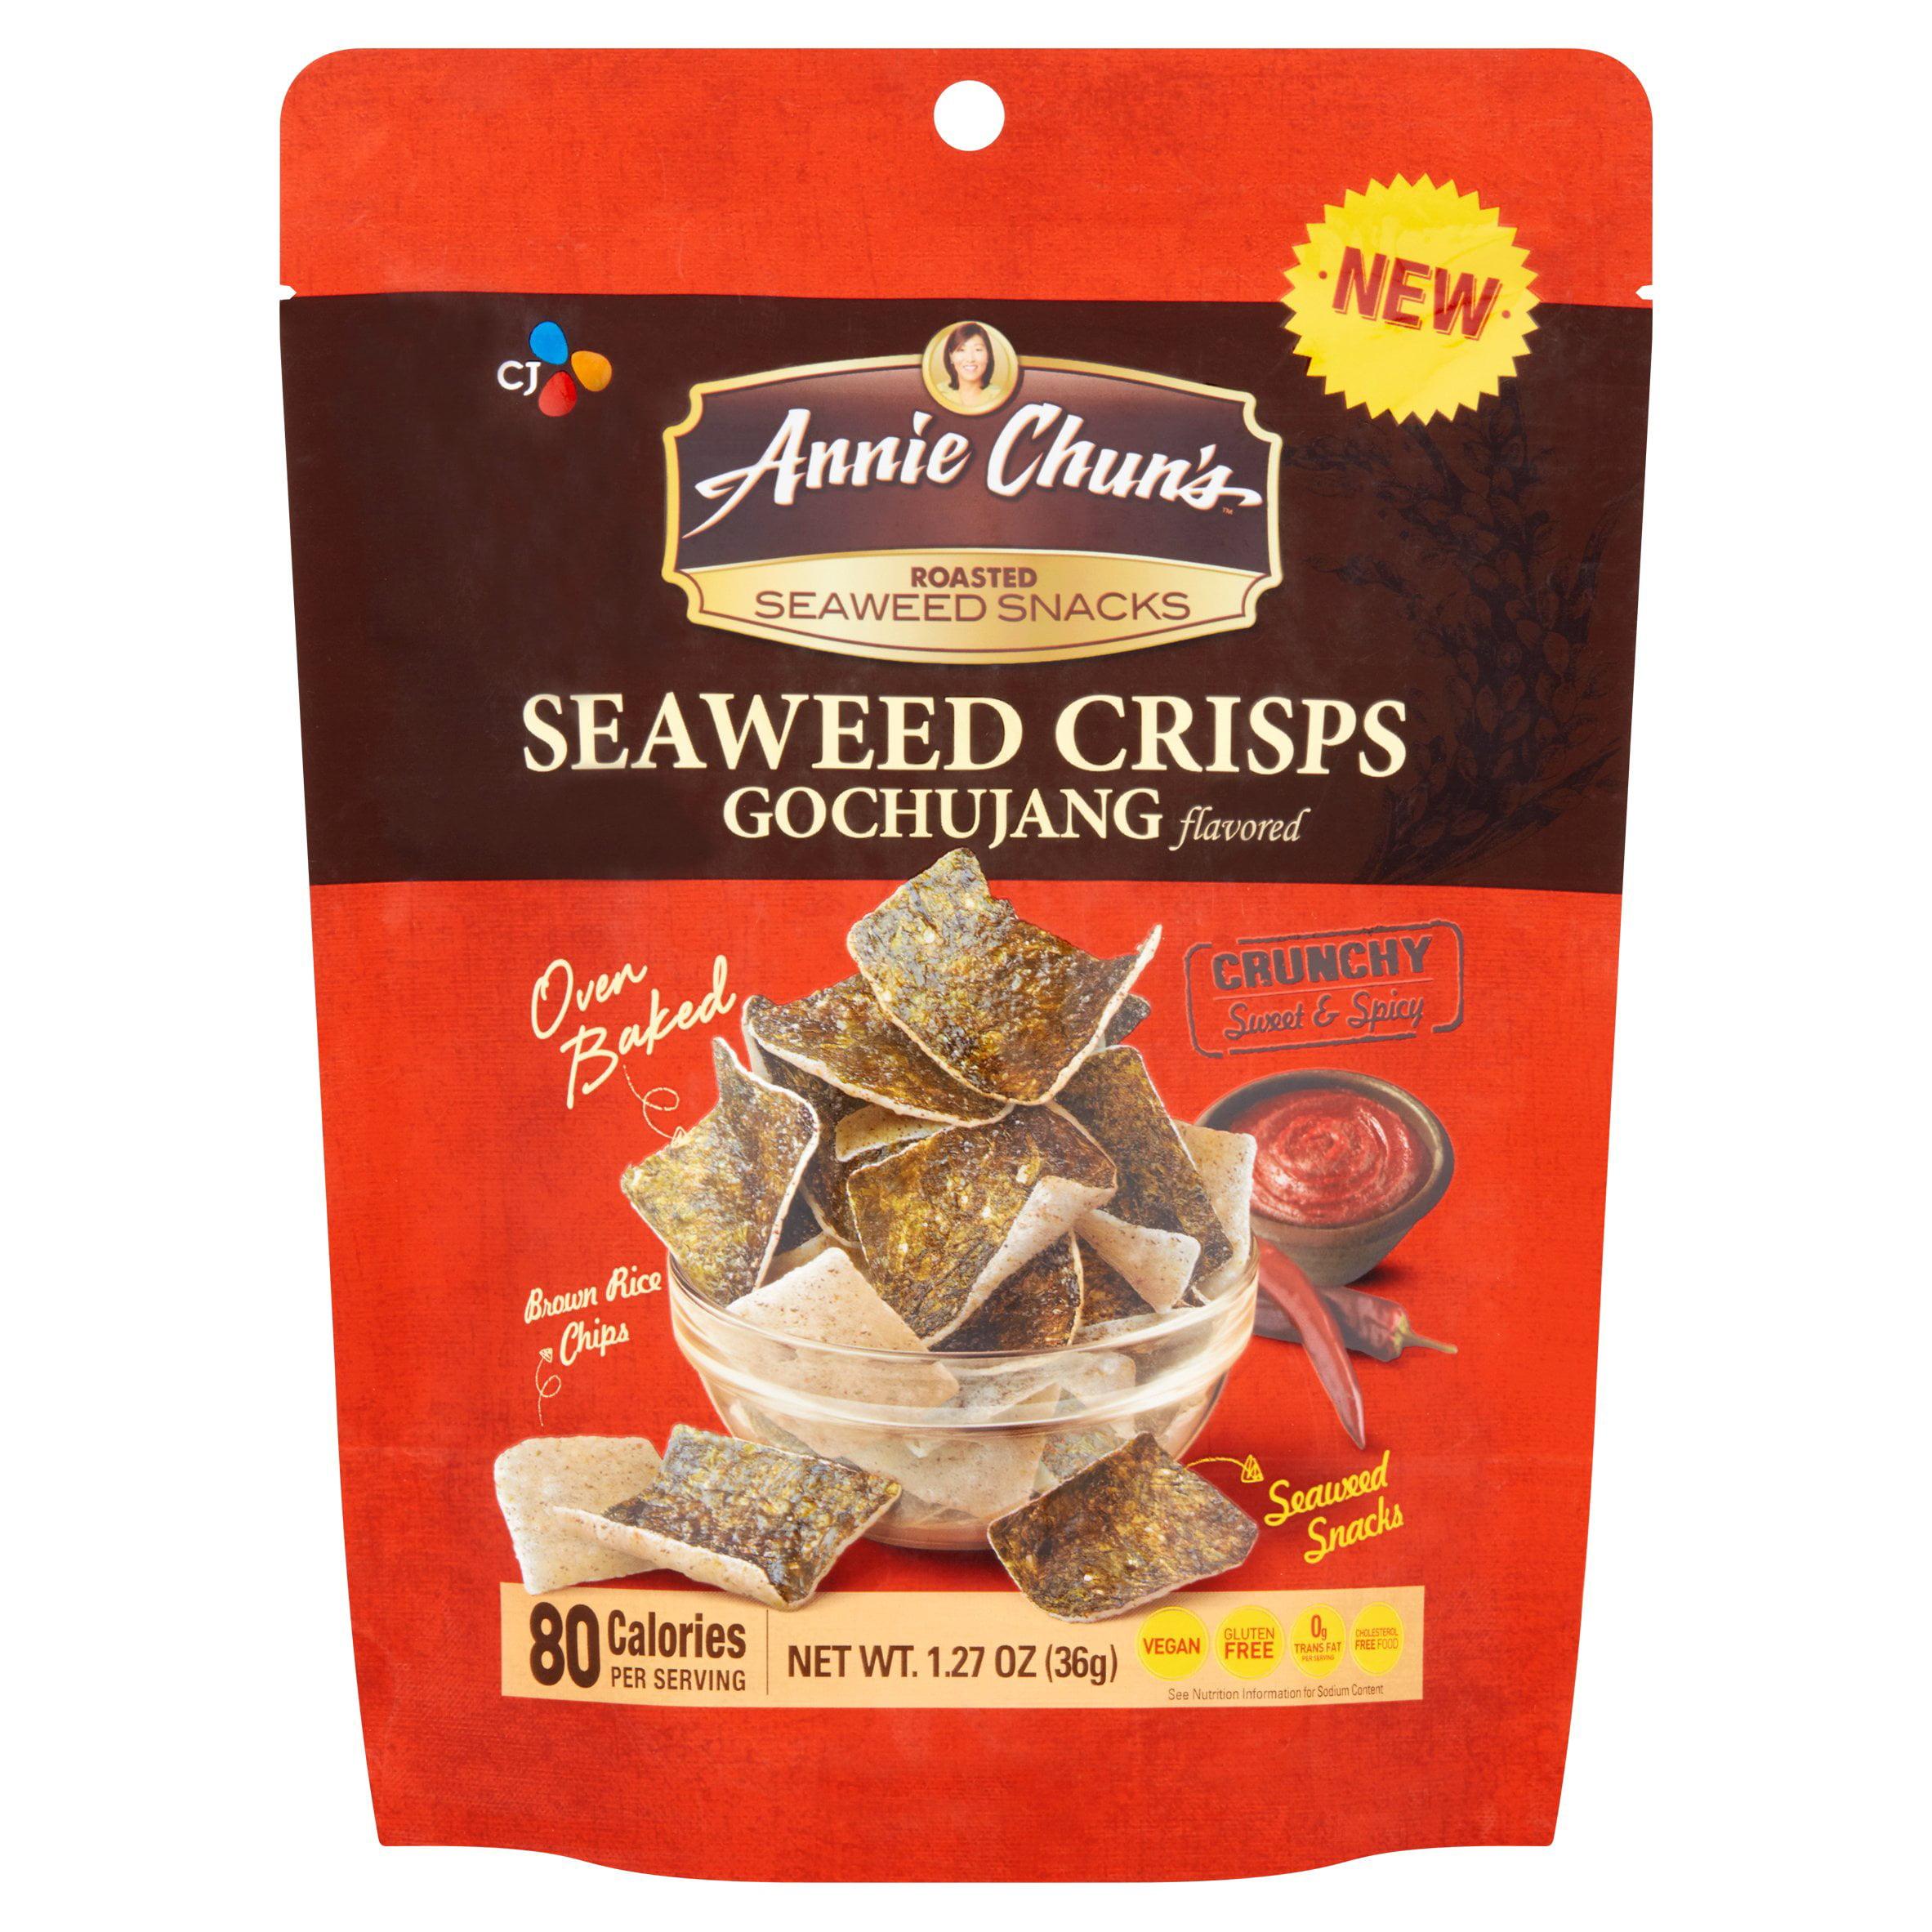 Annie Chuns Seaweed Crisps, Gochujang Flavored by CJ Foods, Inc.